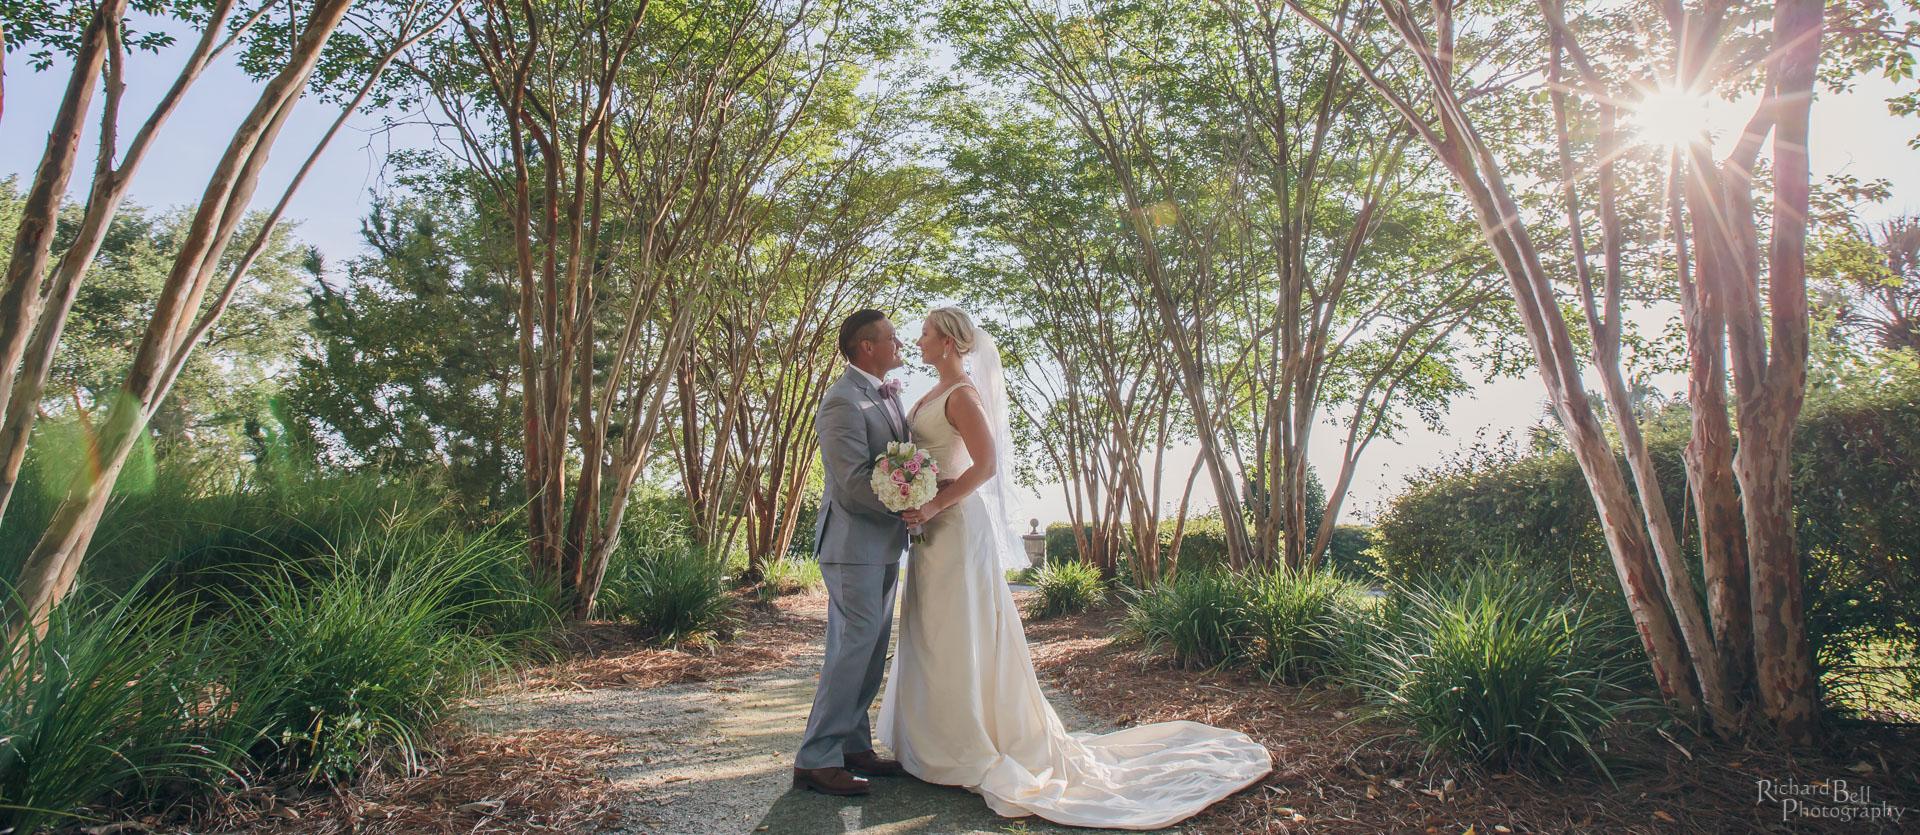 Bride and Groom at Harborside East